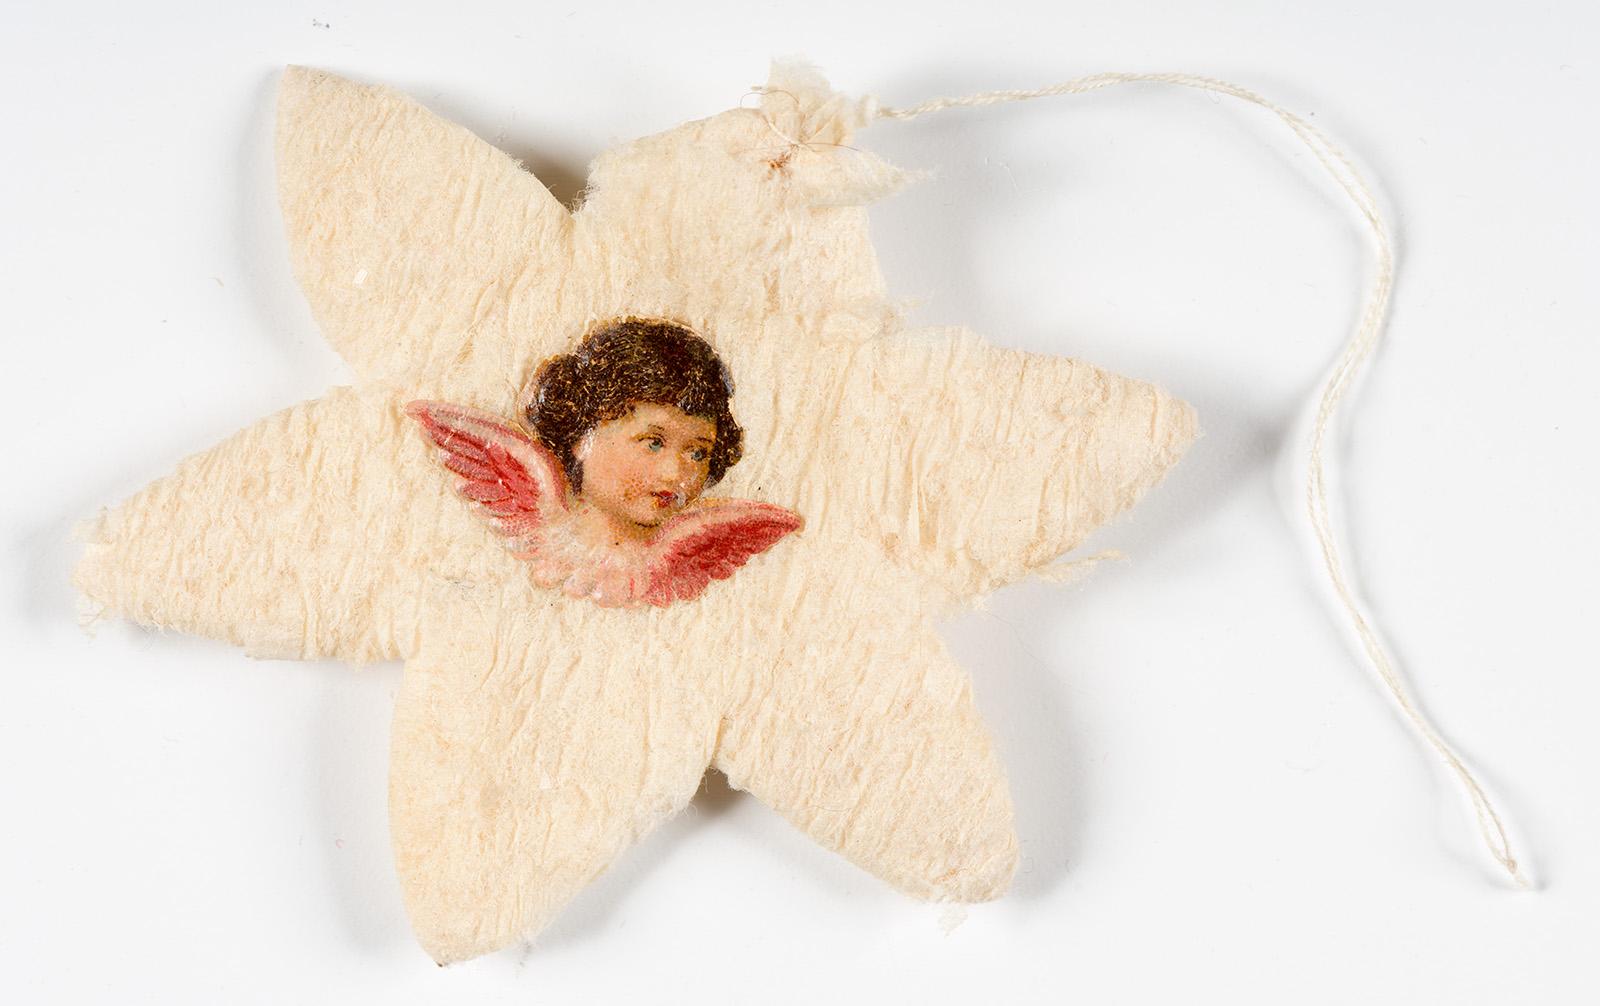 Papist ja villast tärn ingli pildiga,